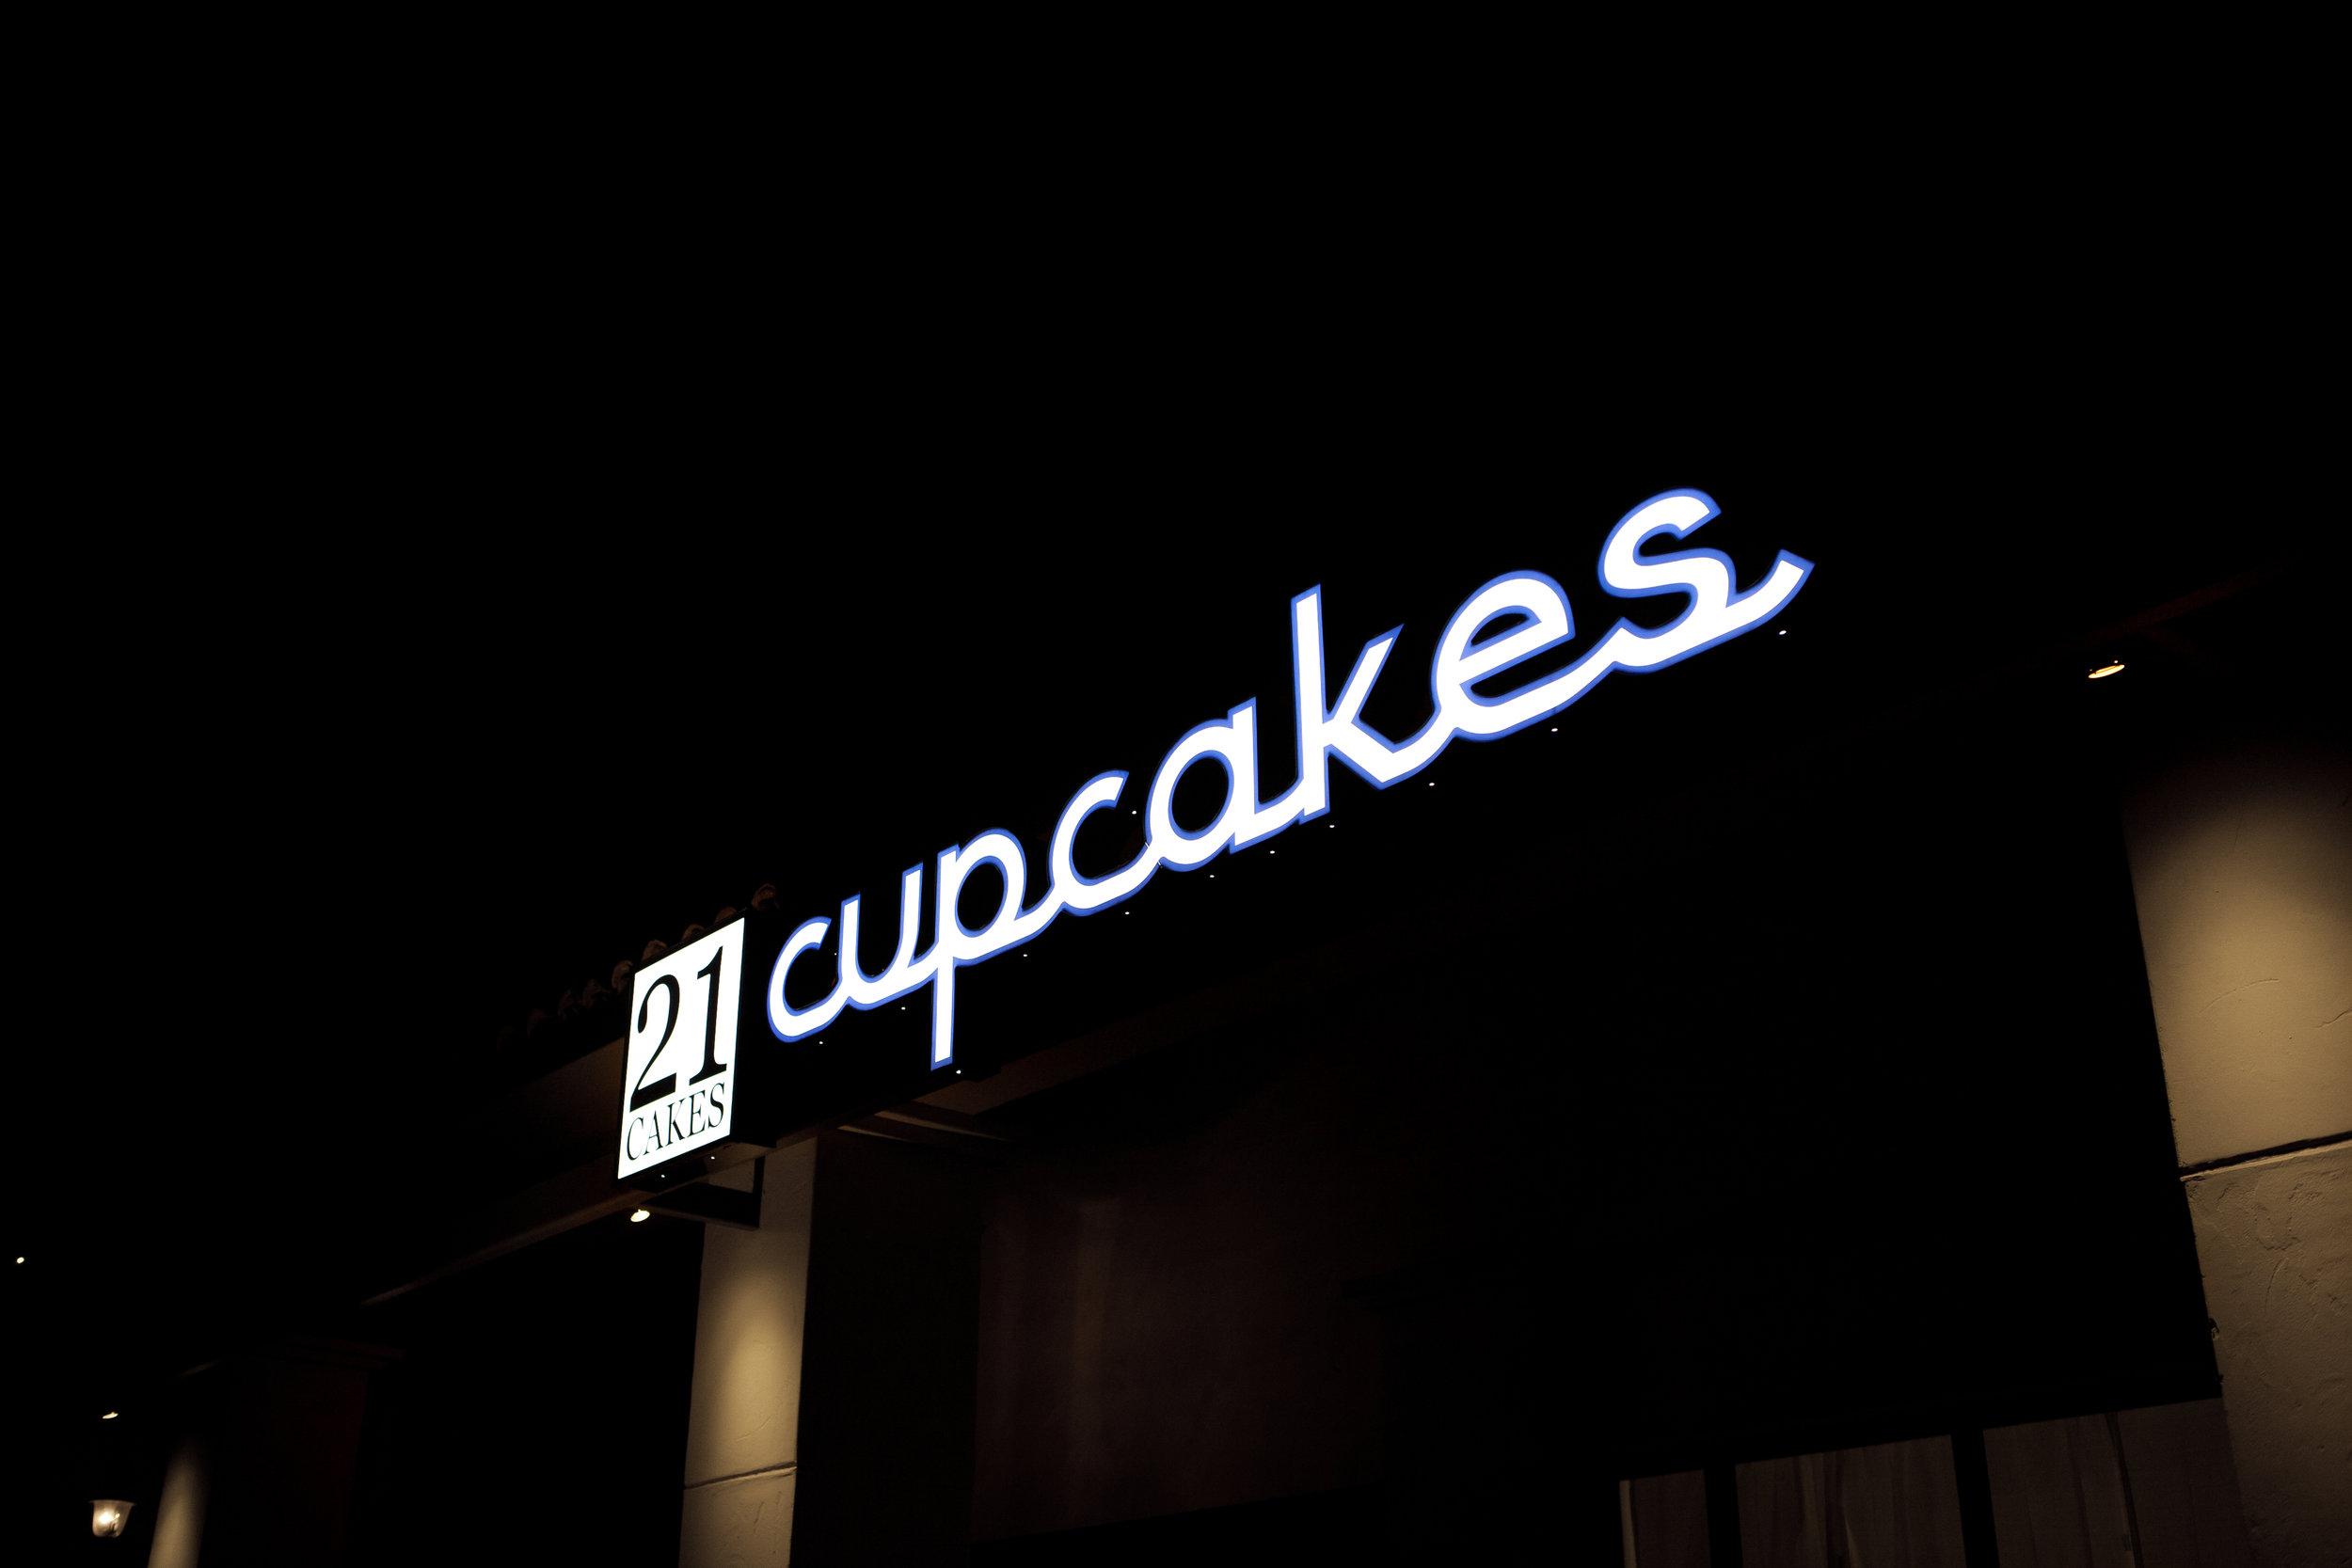 Bar Napkin Productions 21 Cakes Branding Exterior Signage